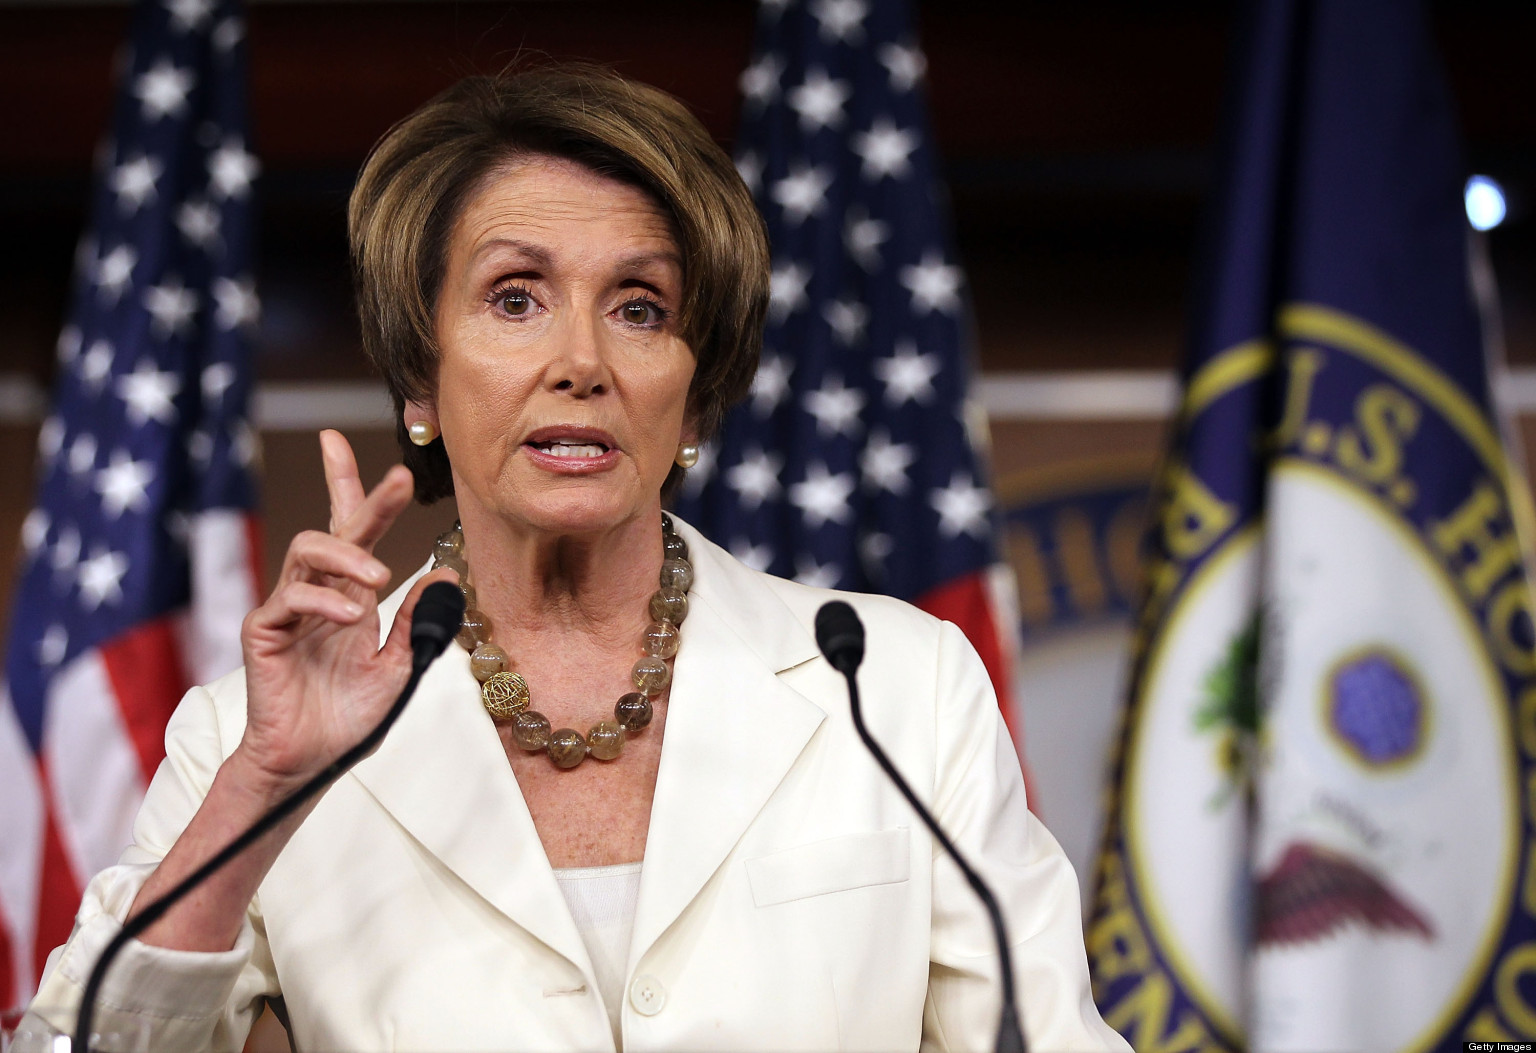 Nancy Pelosi Body